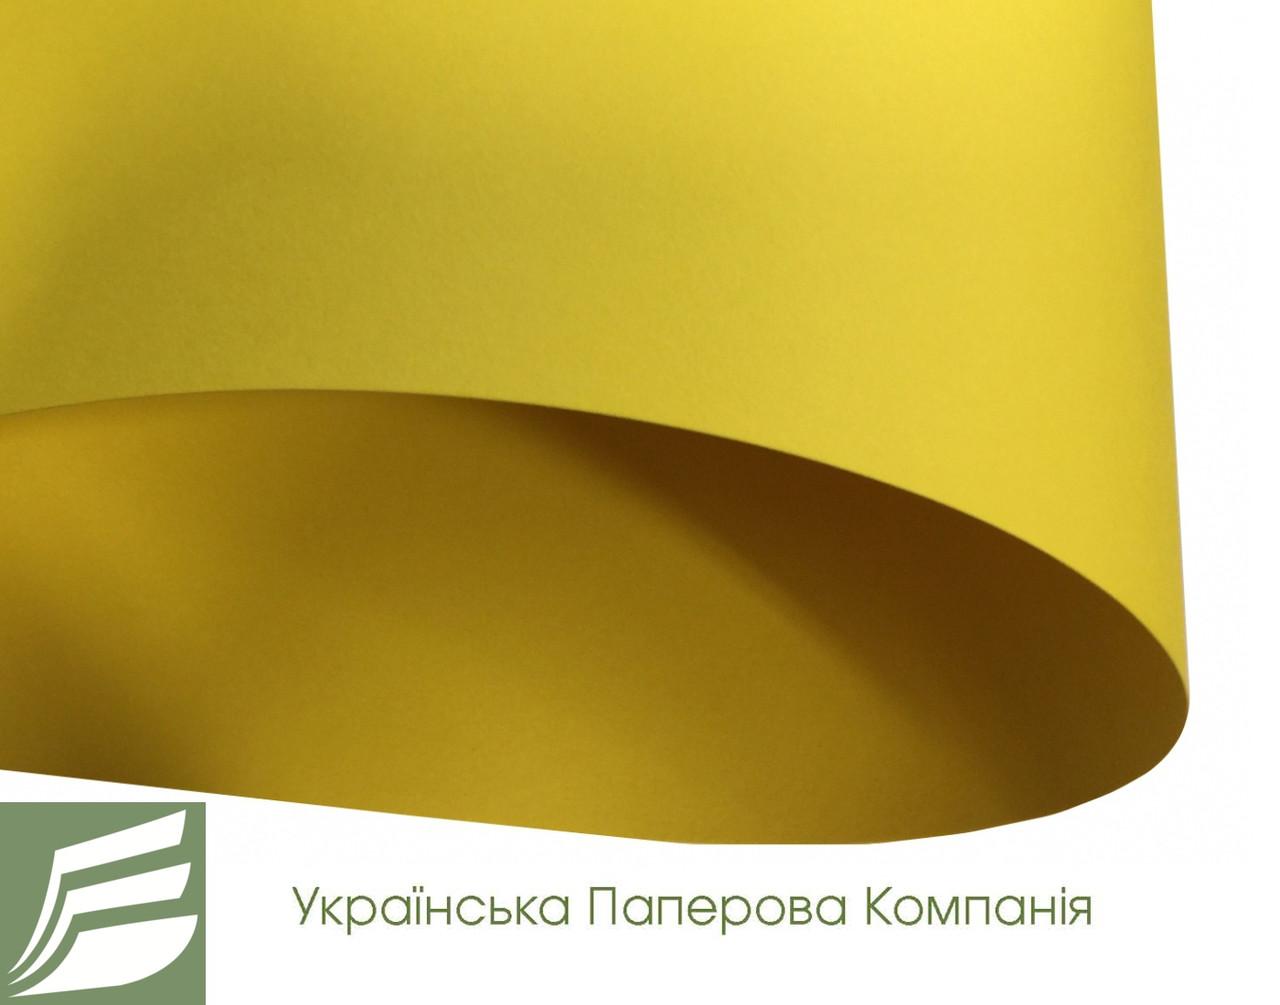 Дизайнерский картон Creative board, матовый желтый, 270 гр/м2